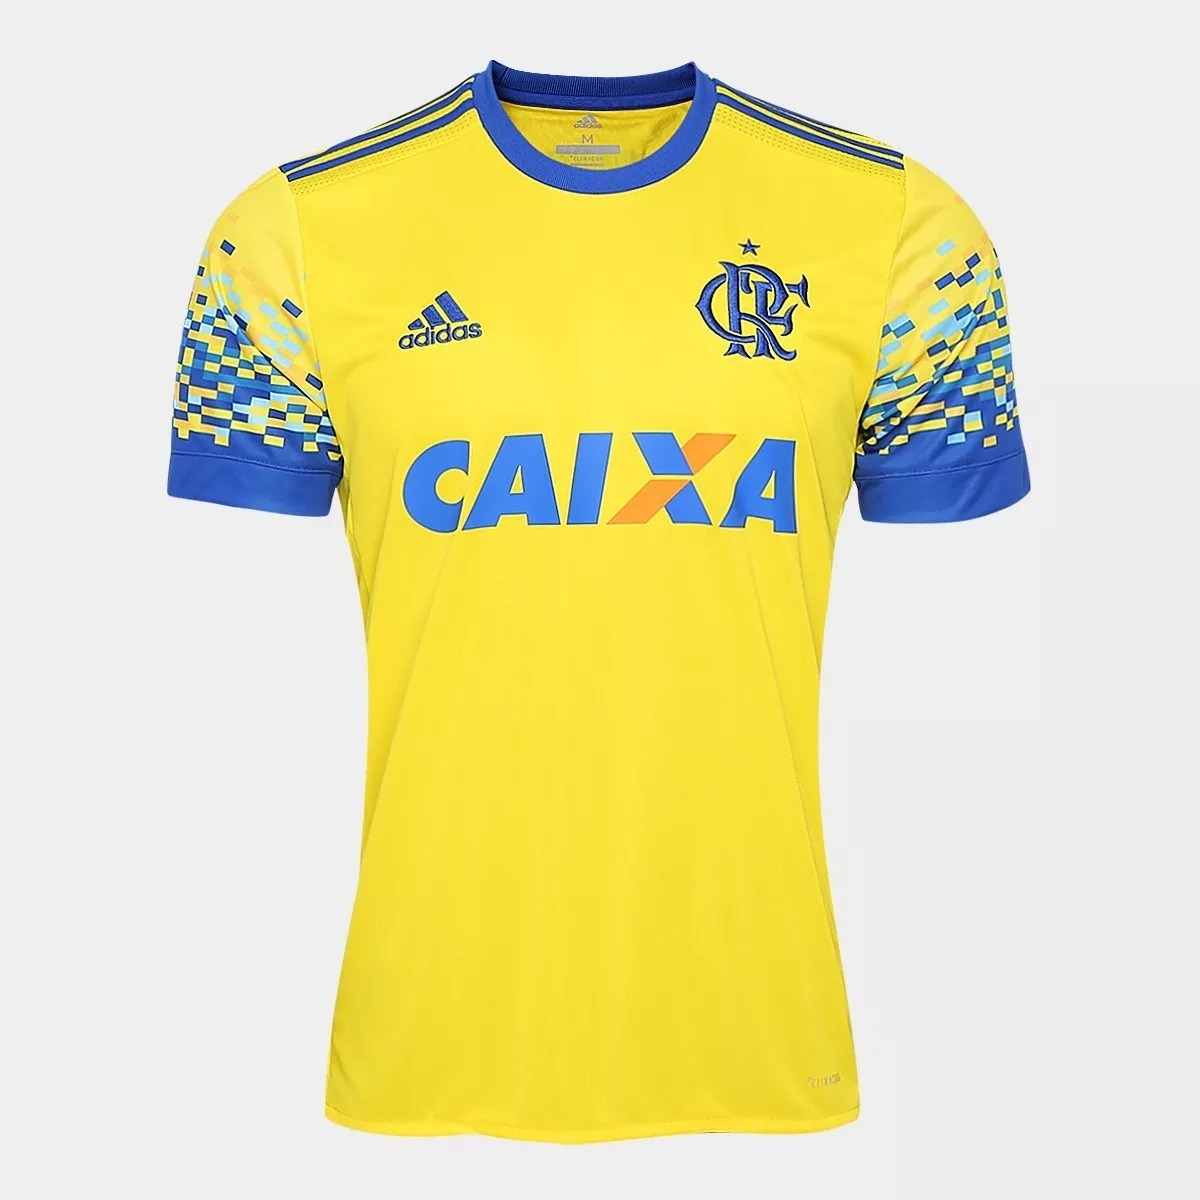 camisa flamengo iii 17 18 s nº torcedor adidas masculina. Carregando zoom. 21737a2fd8743